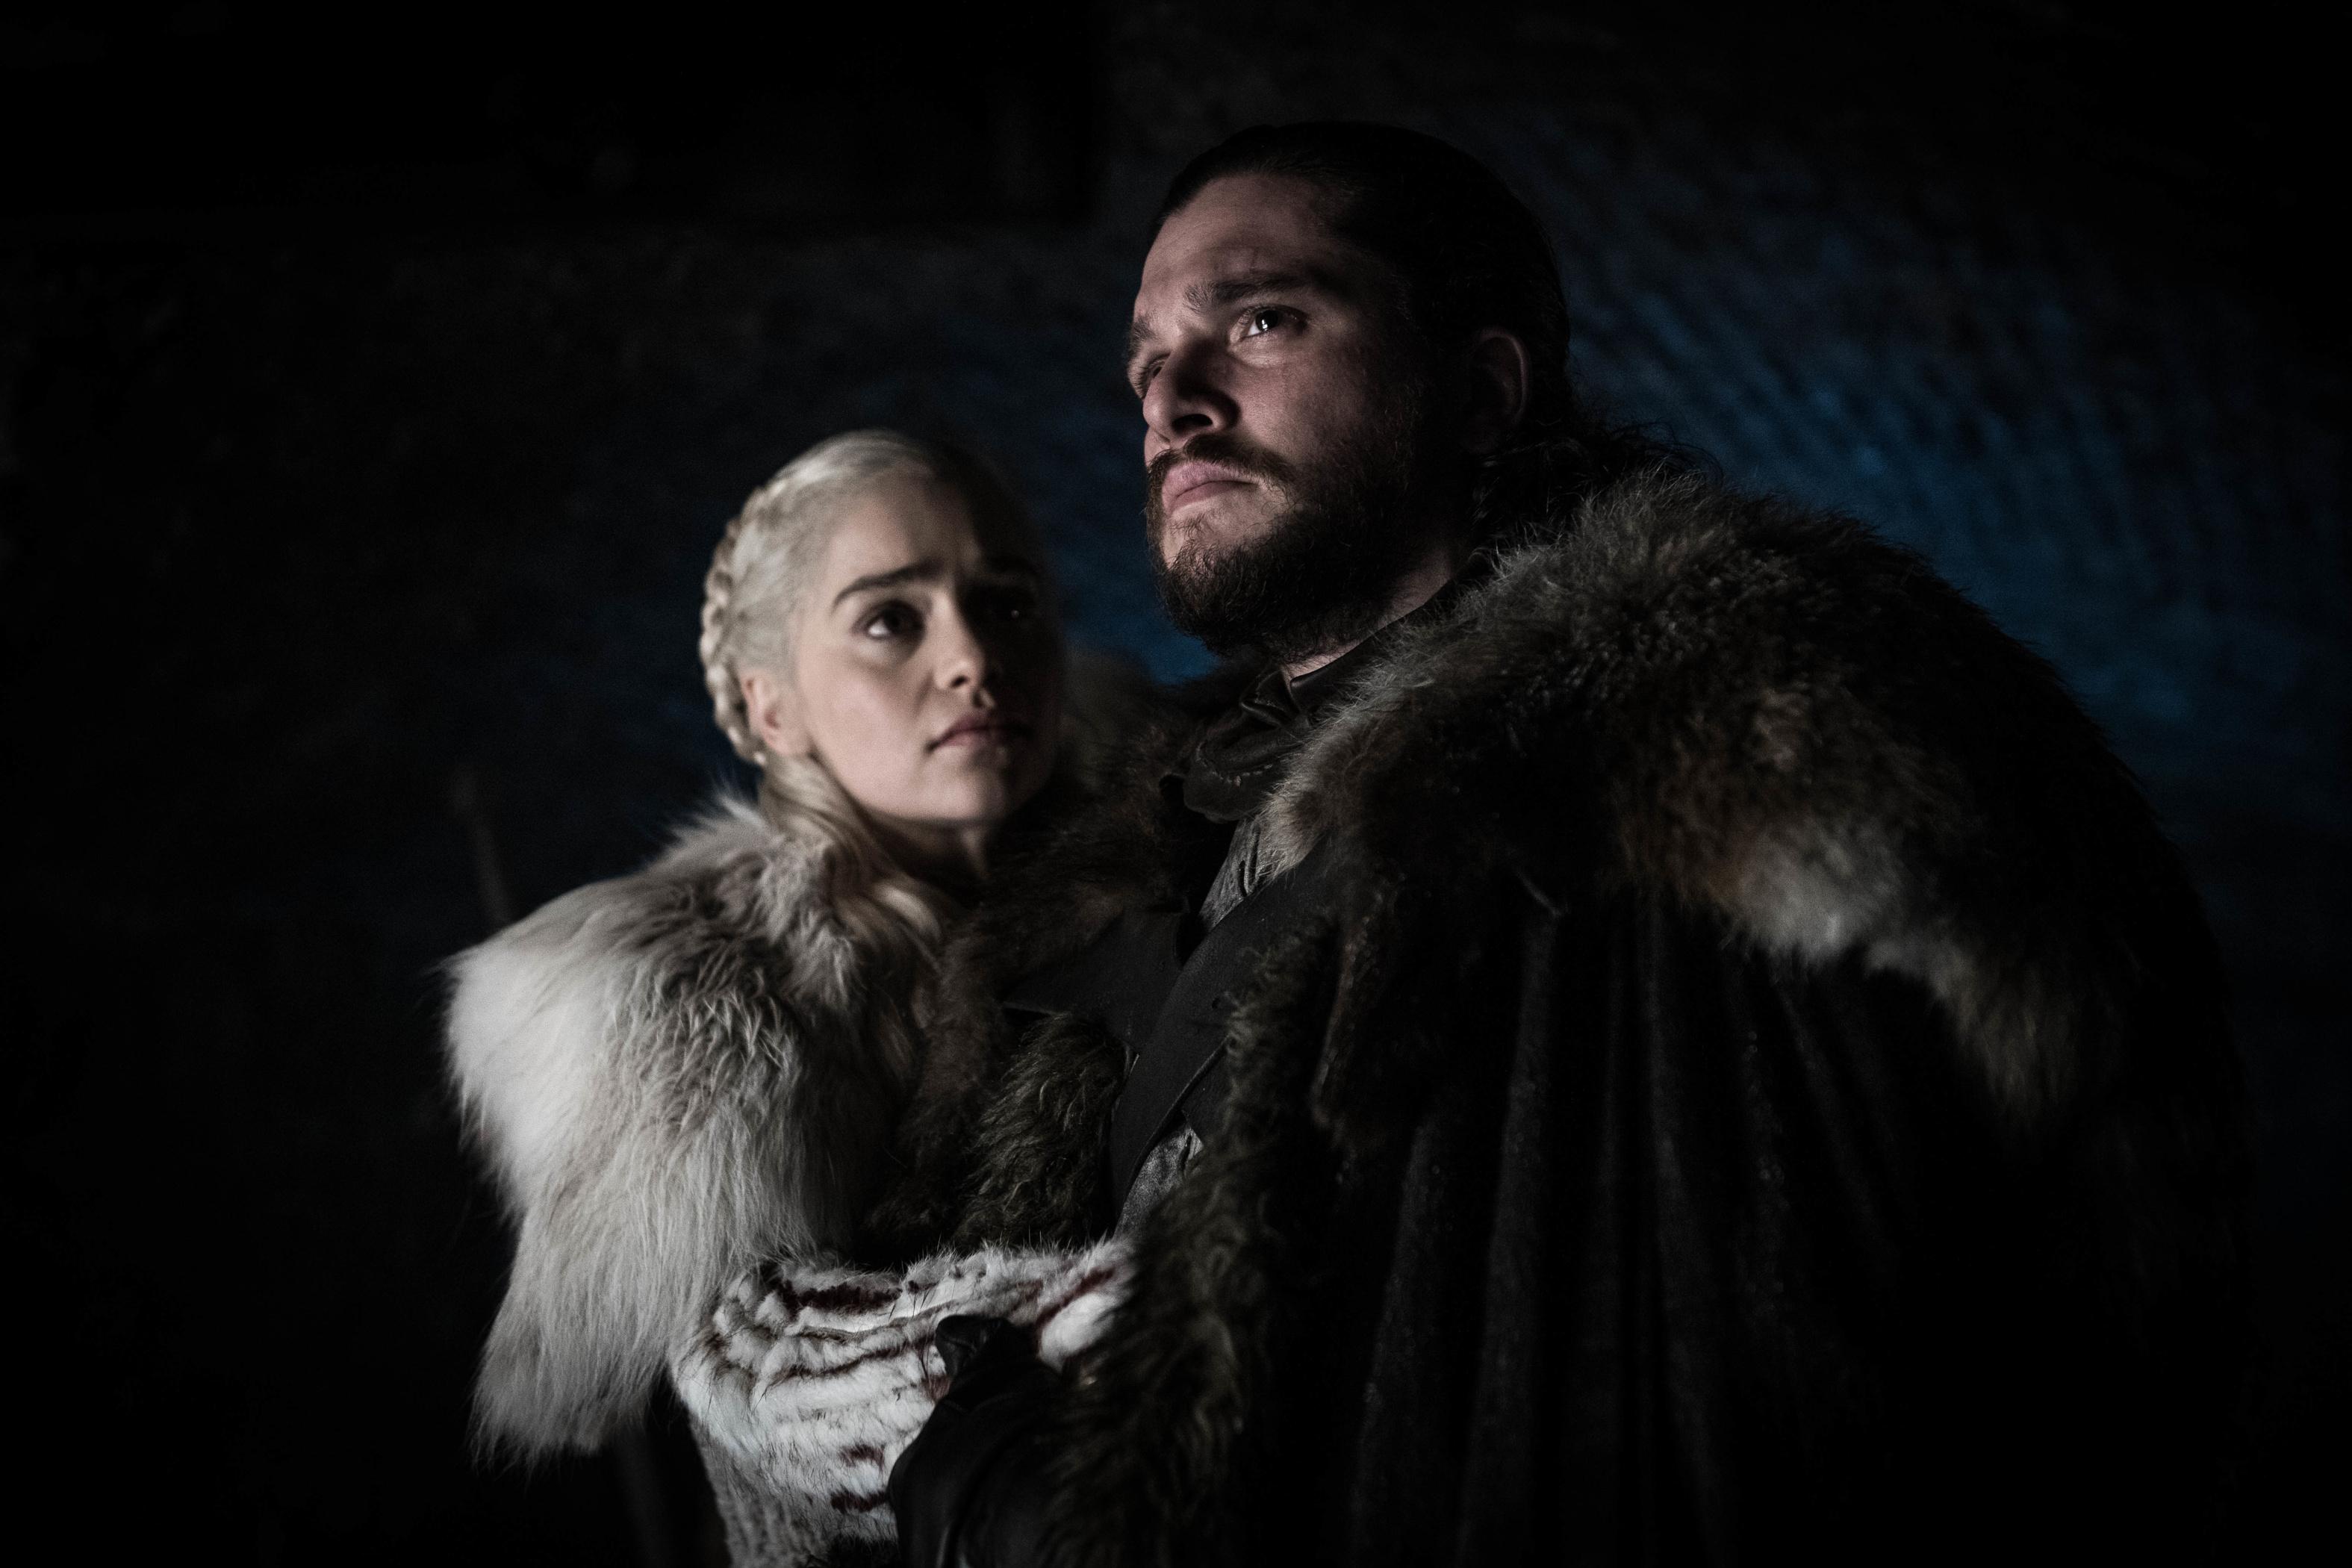 Game Of Thrones Wallpaper Jon Snow 3150x2100 Download Hd Wallpaper Wallpapertip